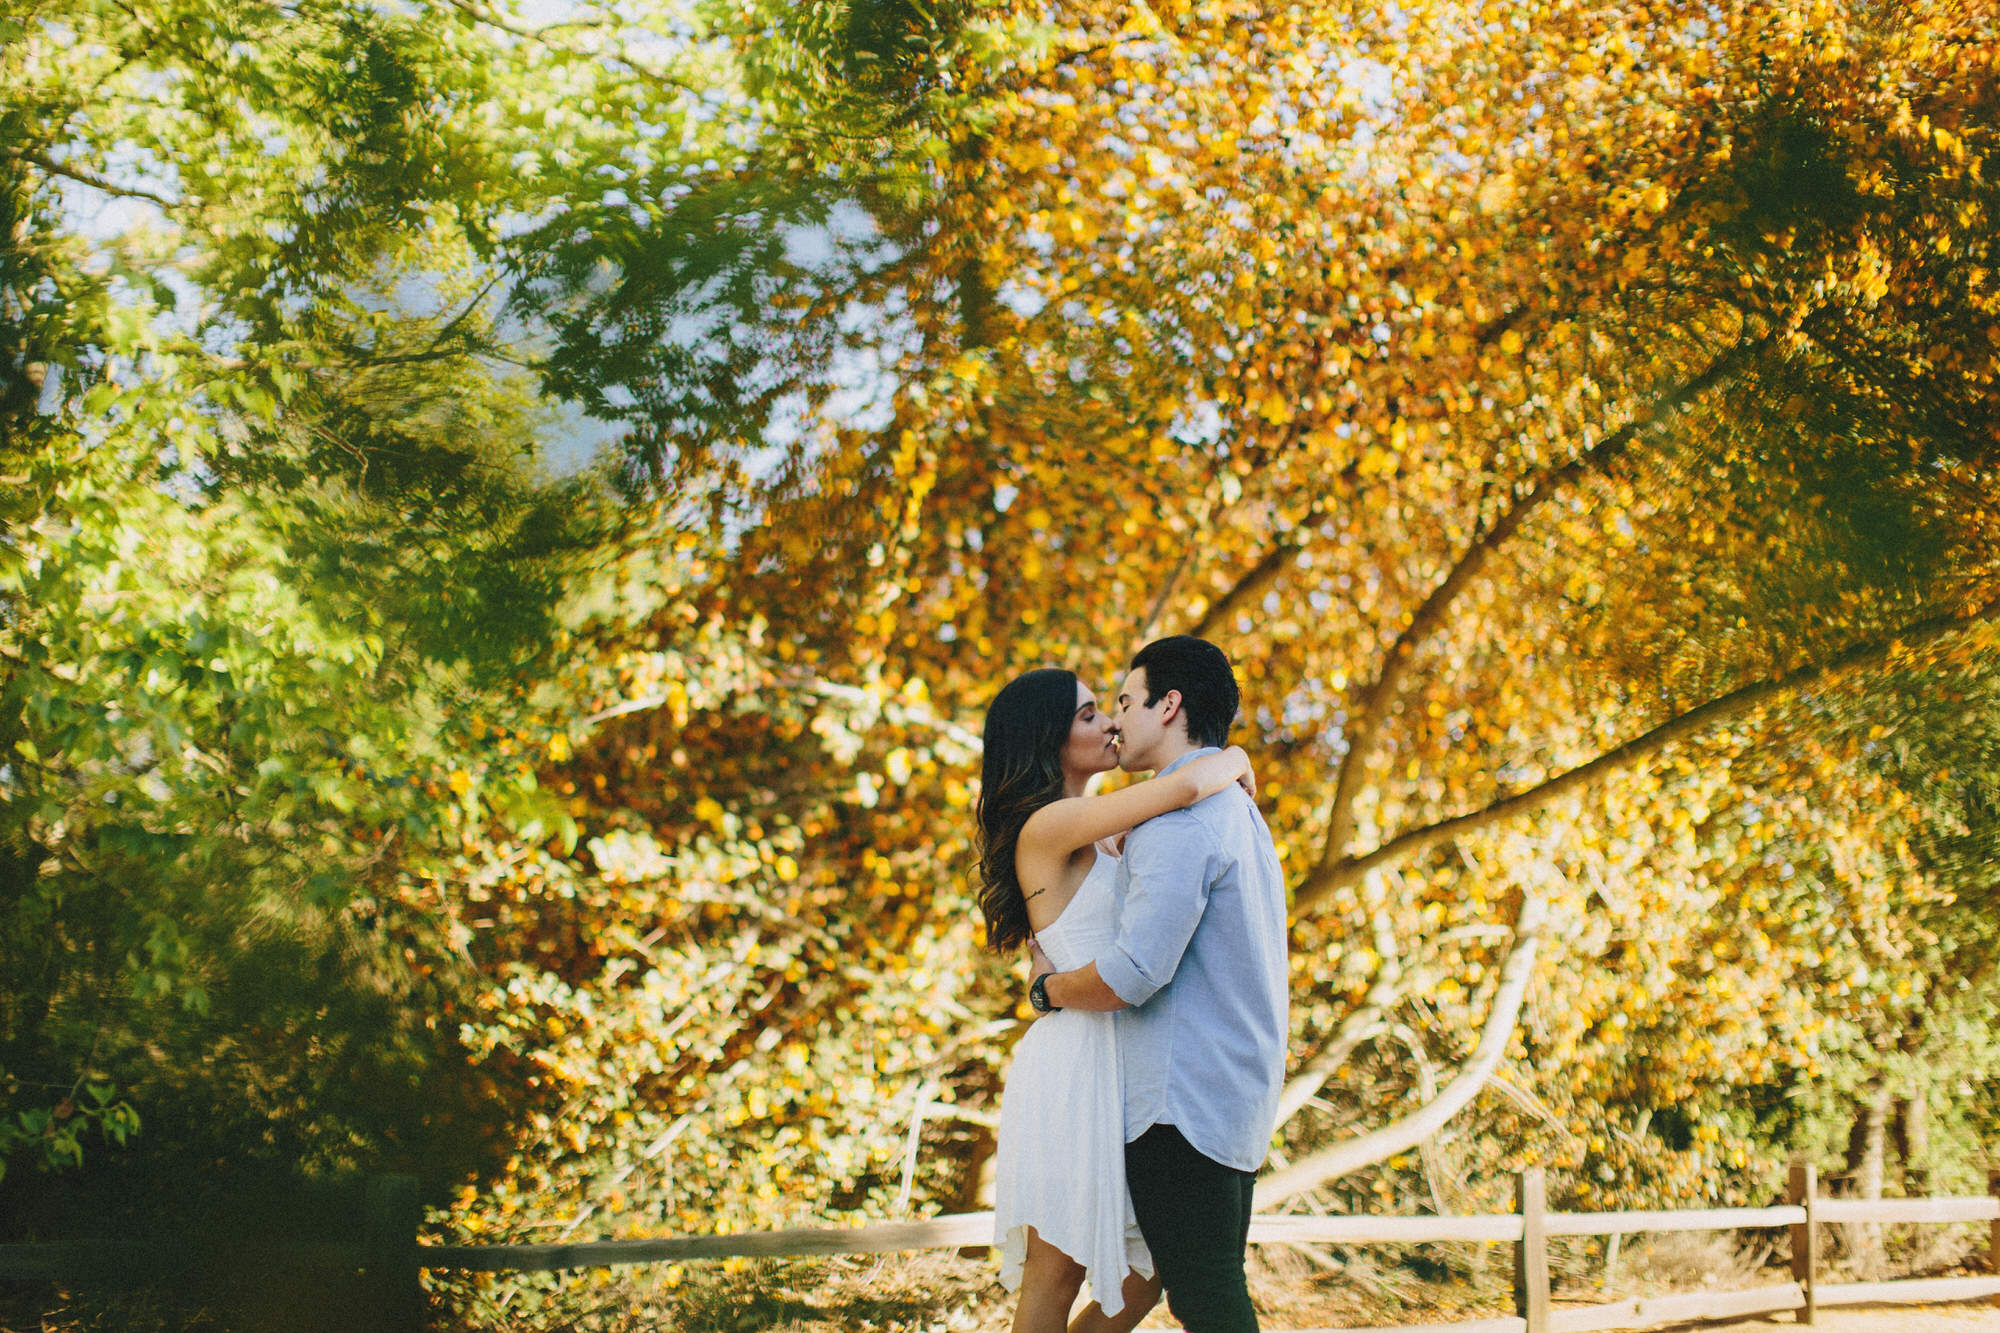 romantic-engagement-02.jpg